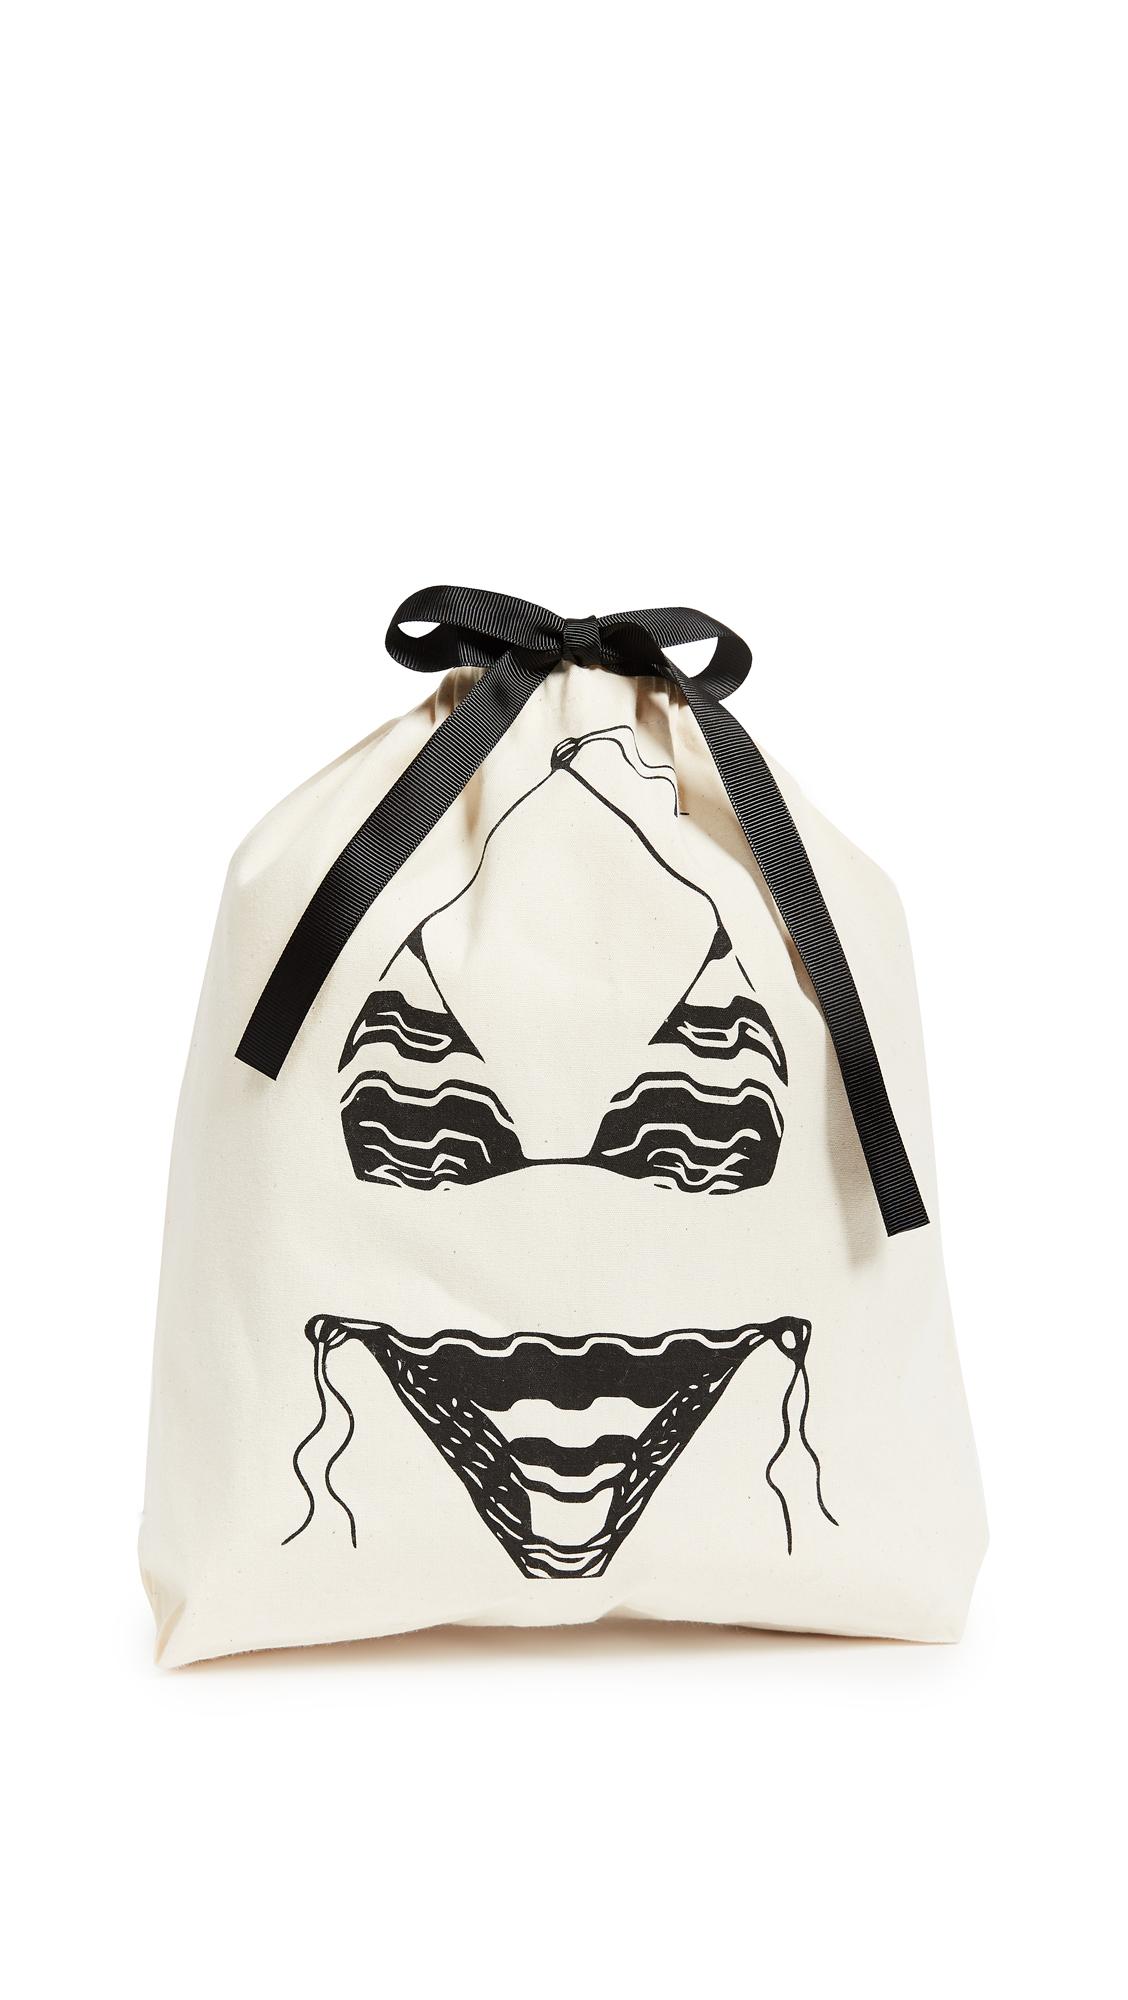 Bag-all Bikini Organizing Bag - Natural/Black